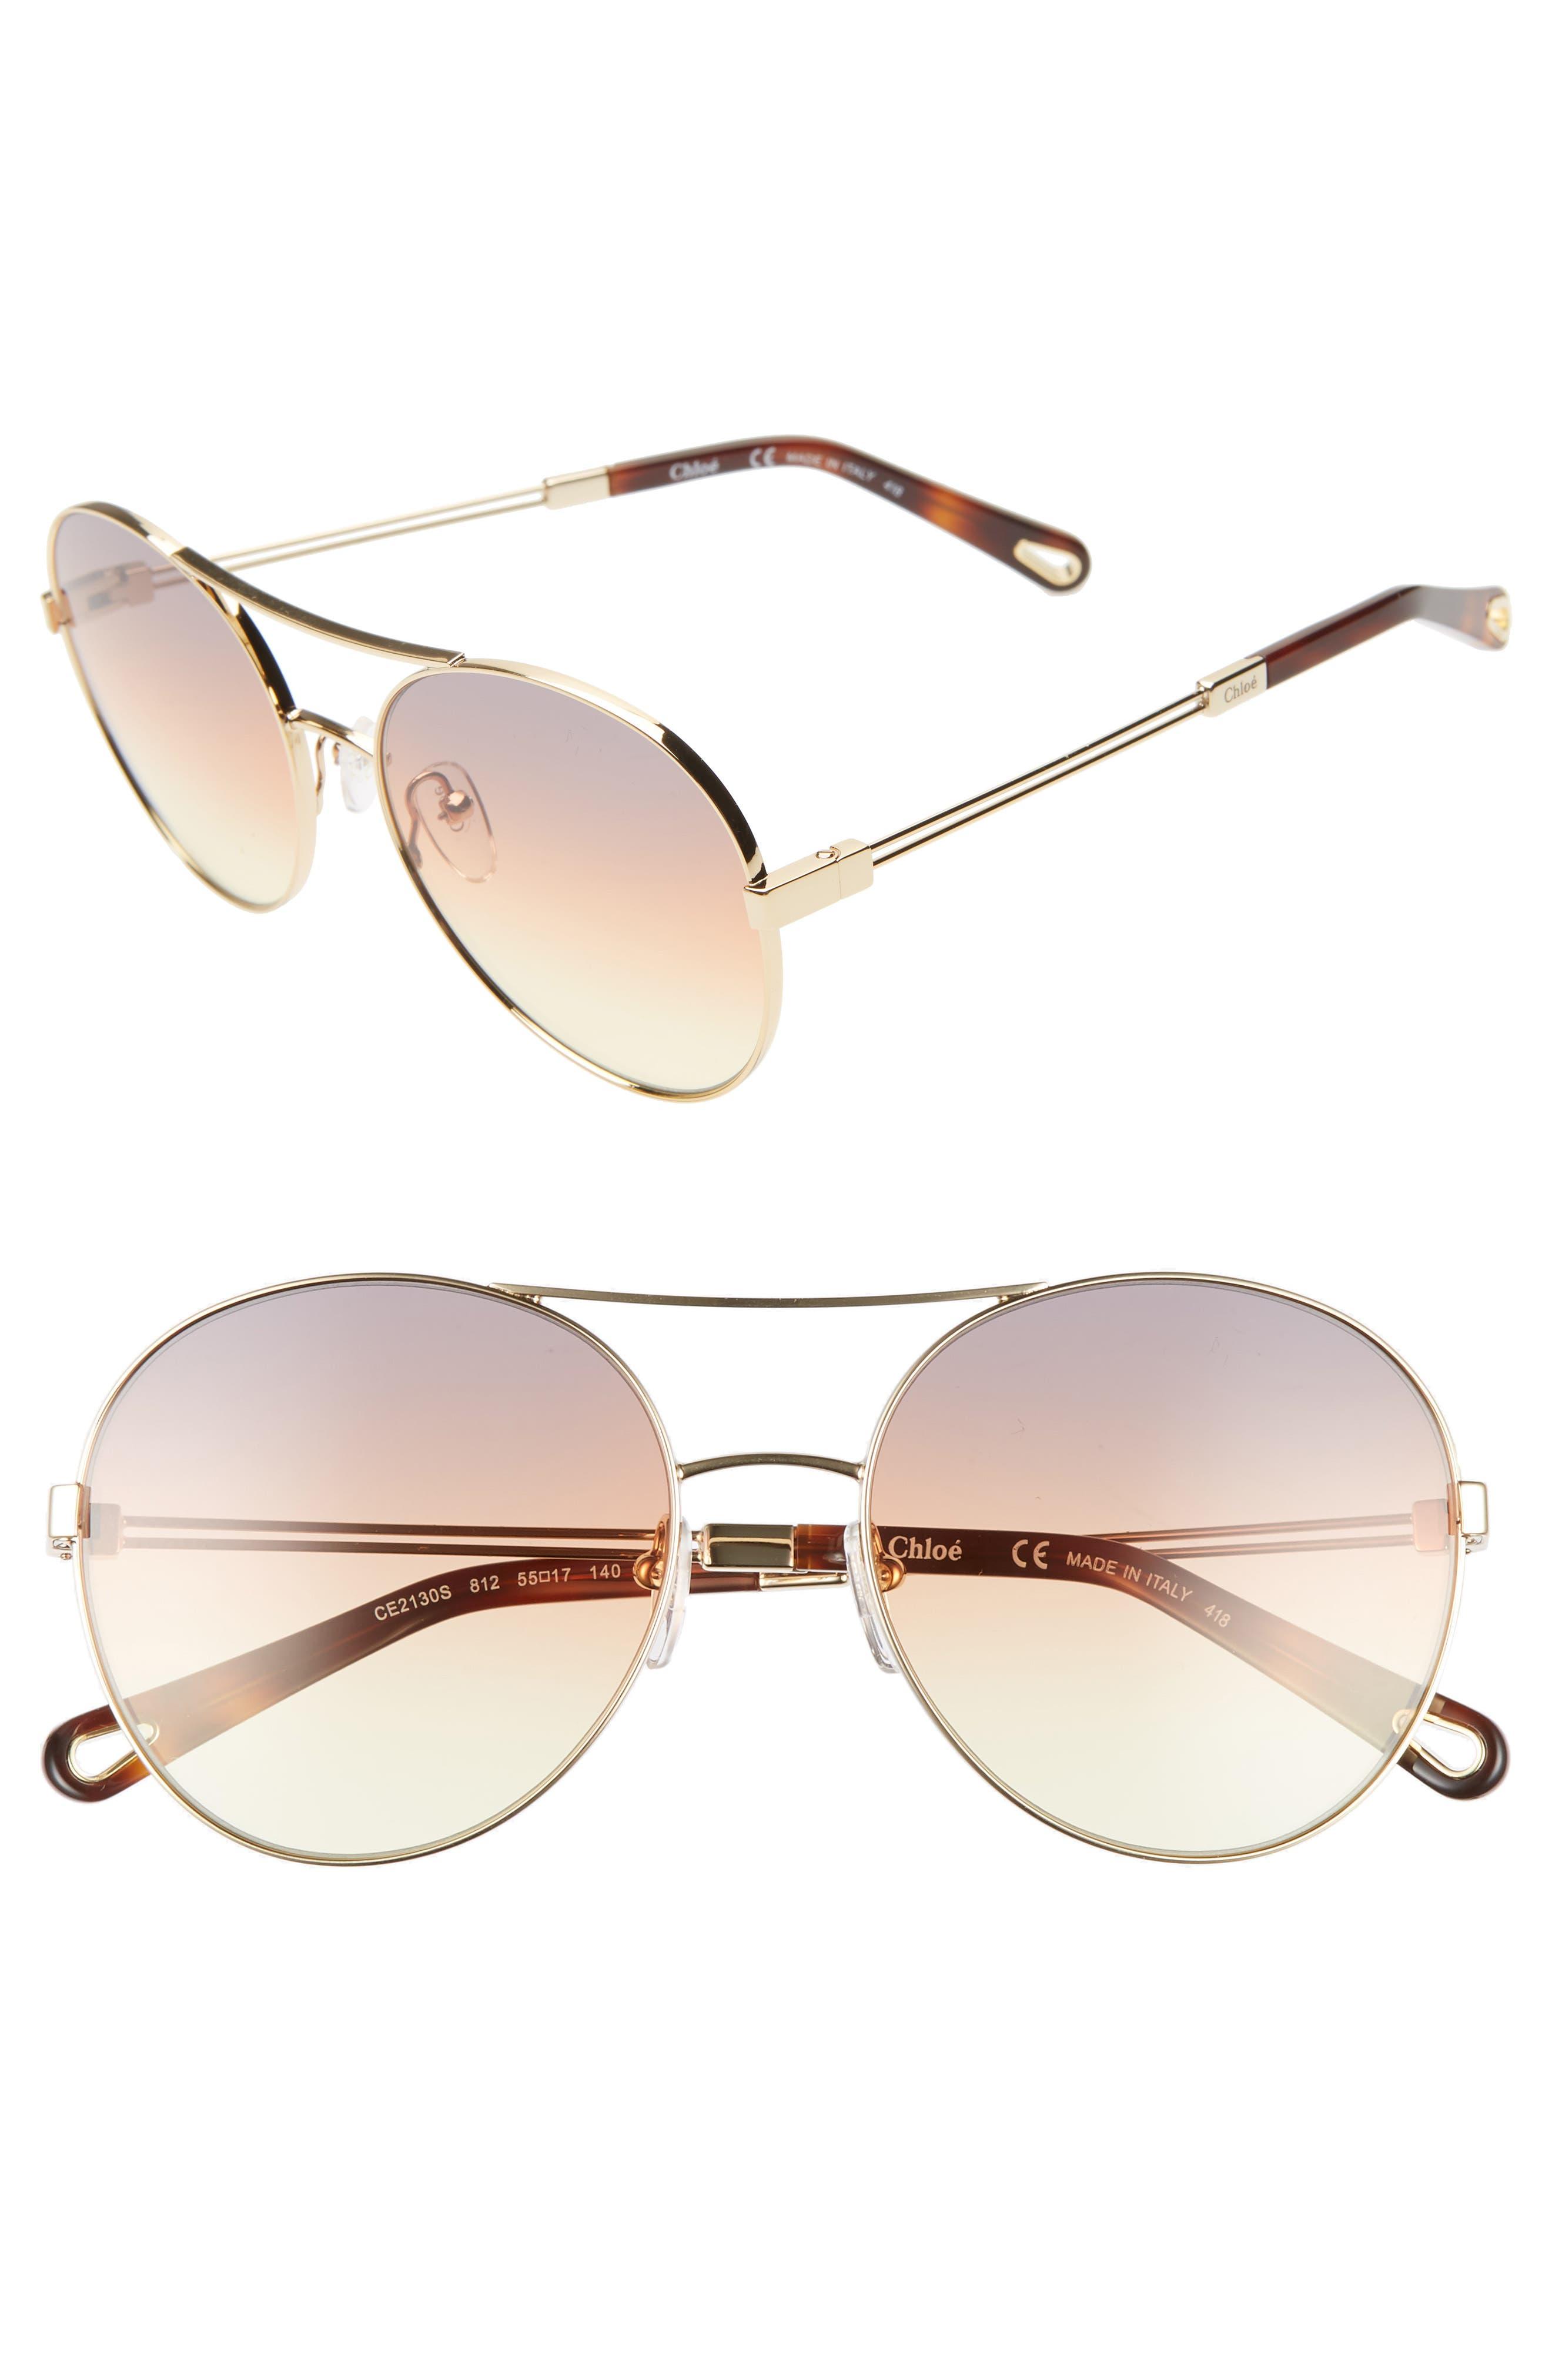 b7546db6c0c9 Chloé Aviator Sunglasses